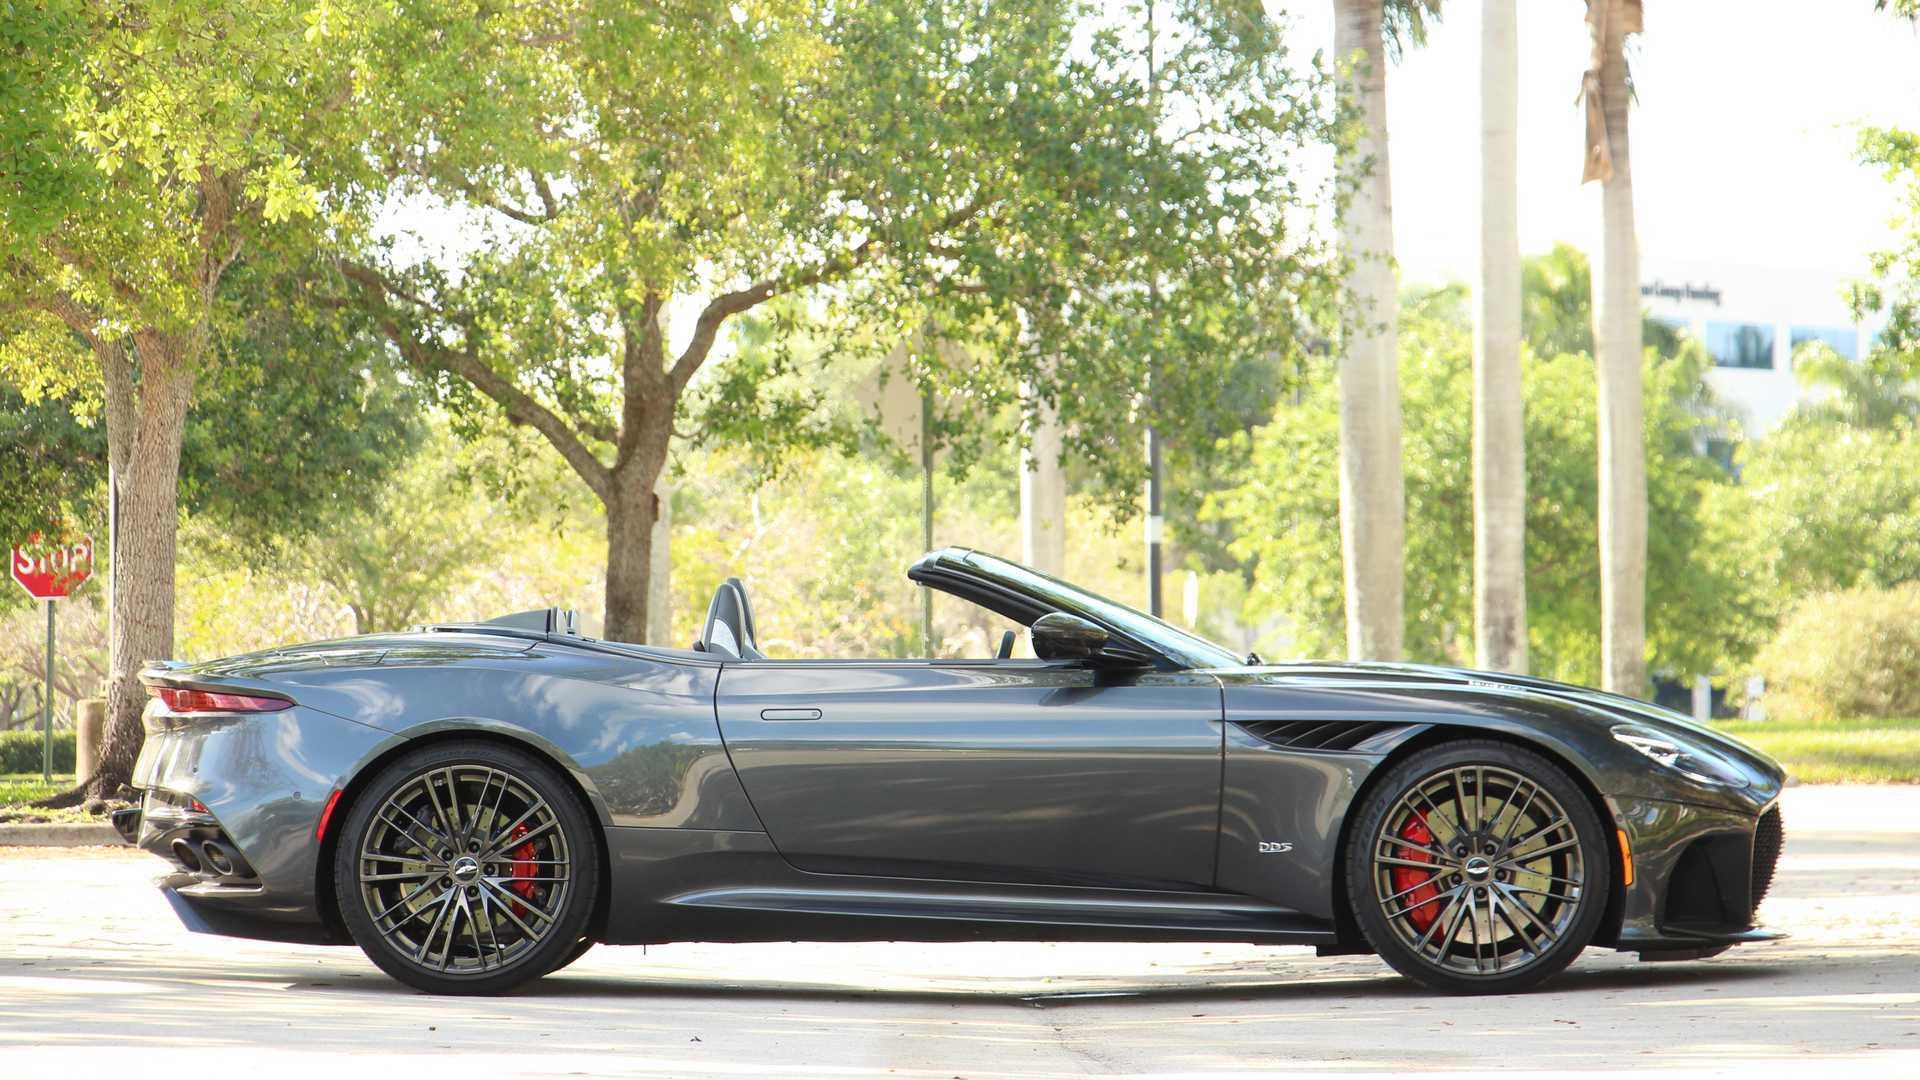 2020 Aston Martin Dbs Superleggera Volante Review Superlative